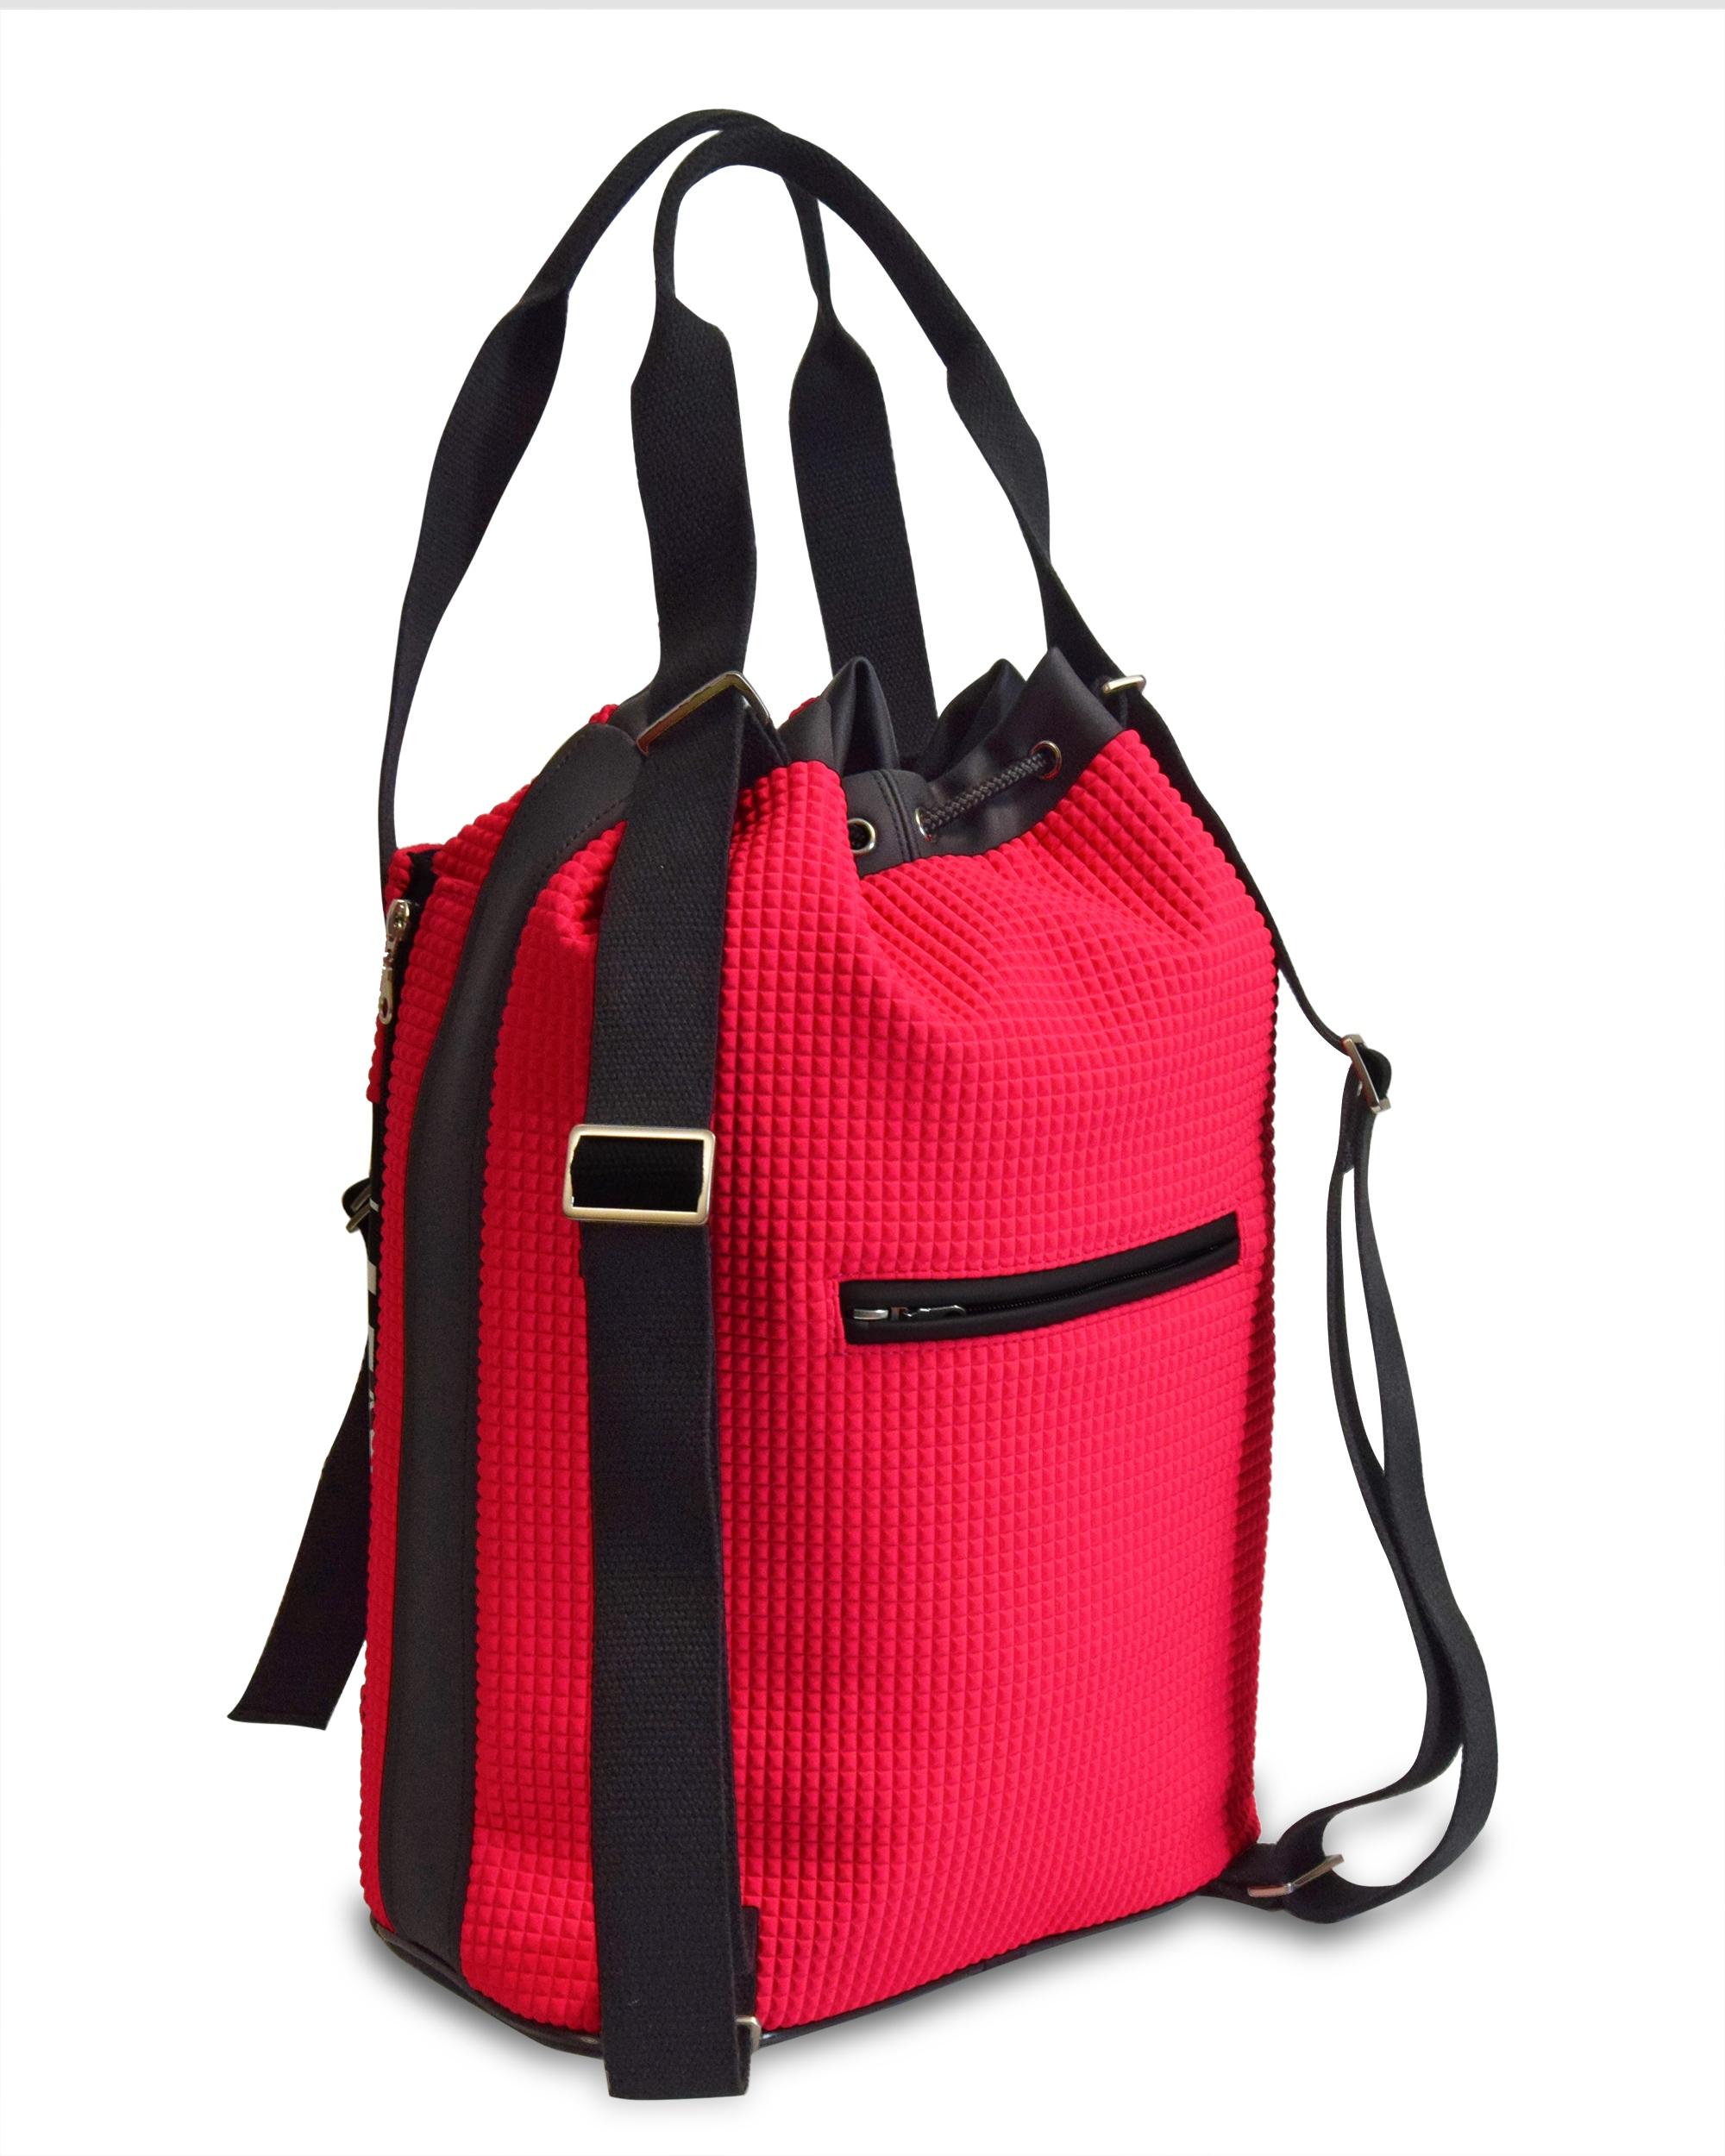 TENNIS BACKPACK WOMEN SCUBA PINK The perfect tennis bag ...